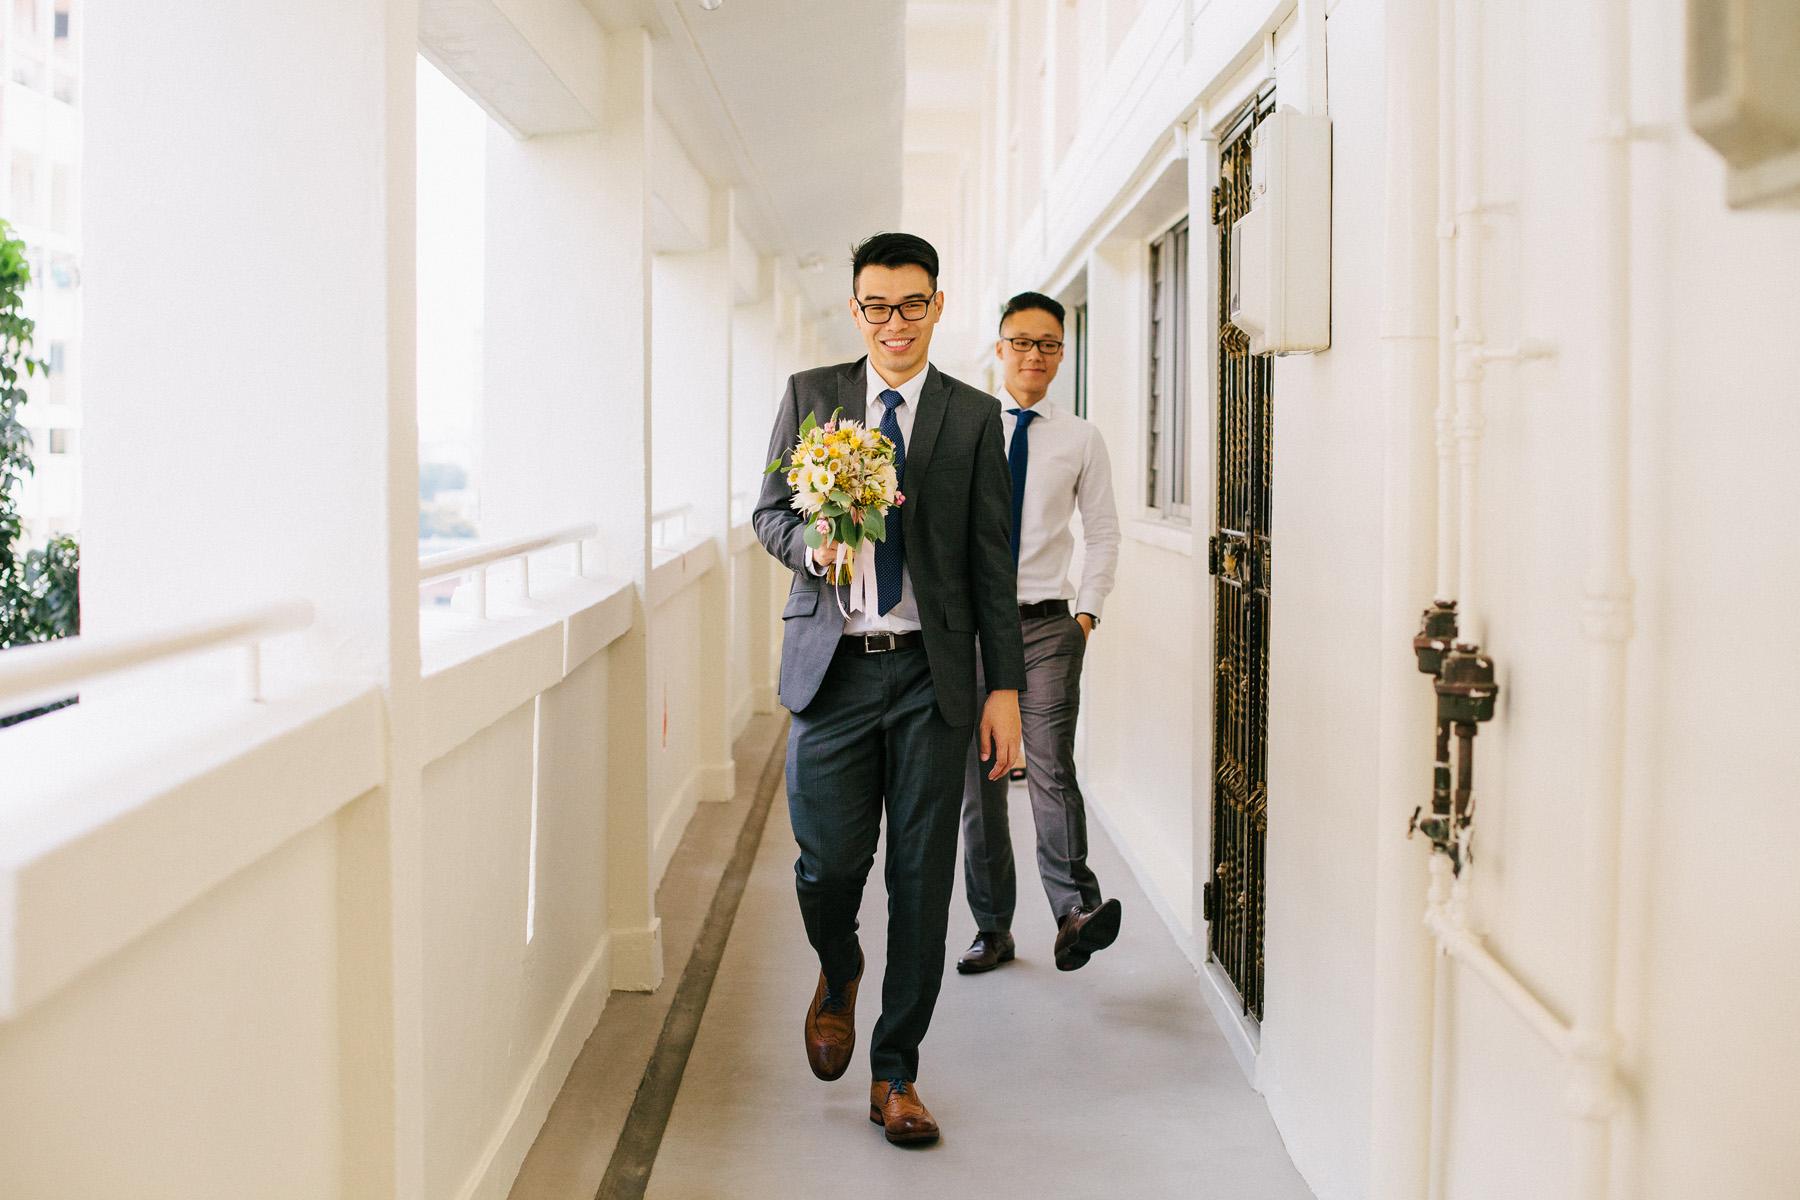 singapore-wedding-travel-photographer-faith-alvin-wedding-wmt-09.jpg